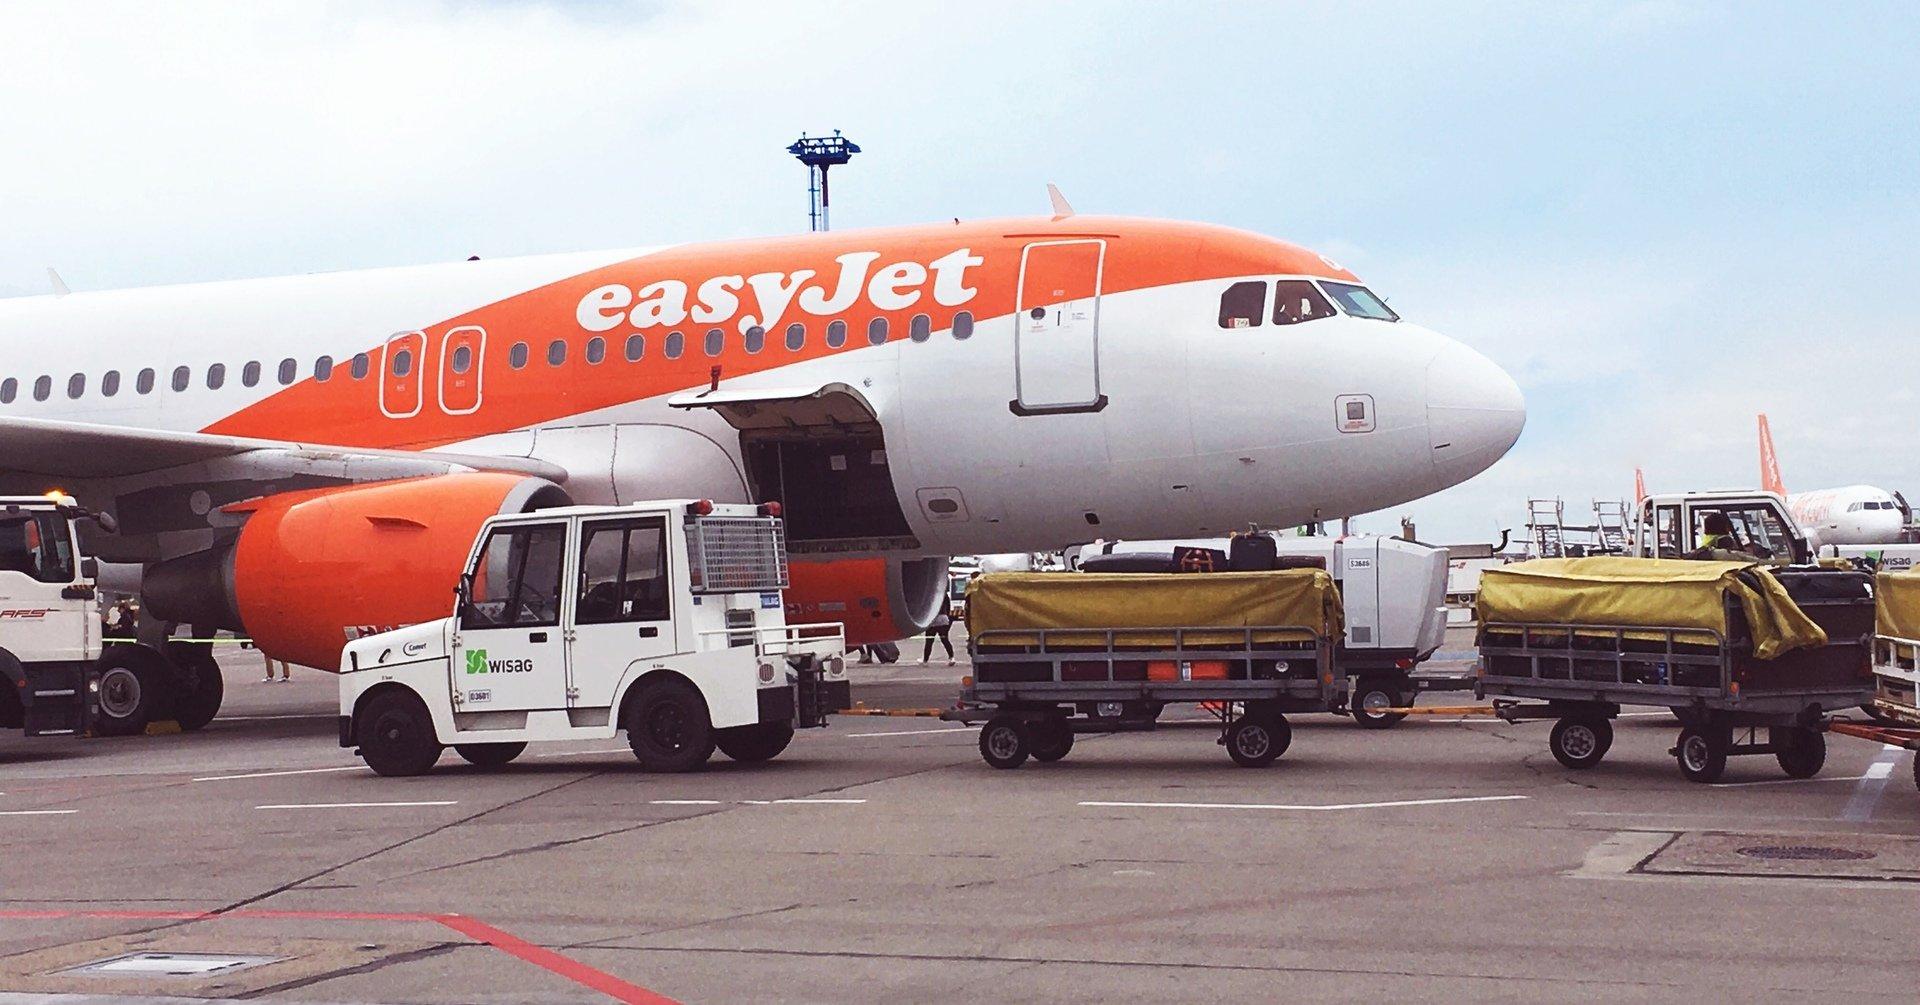 EasyJet flight delay compensation